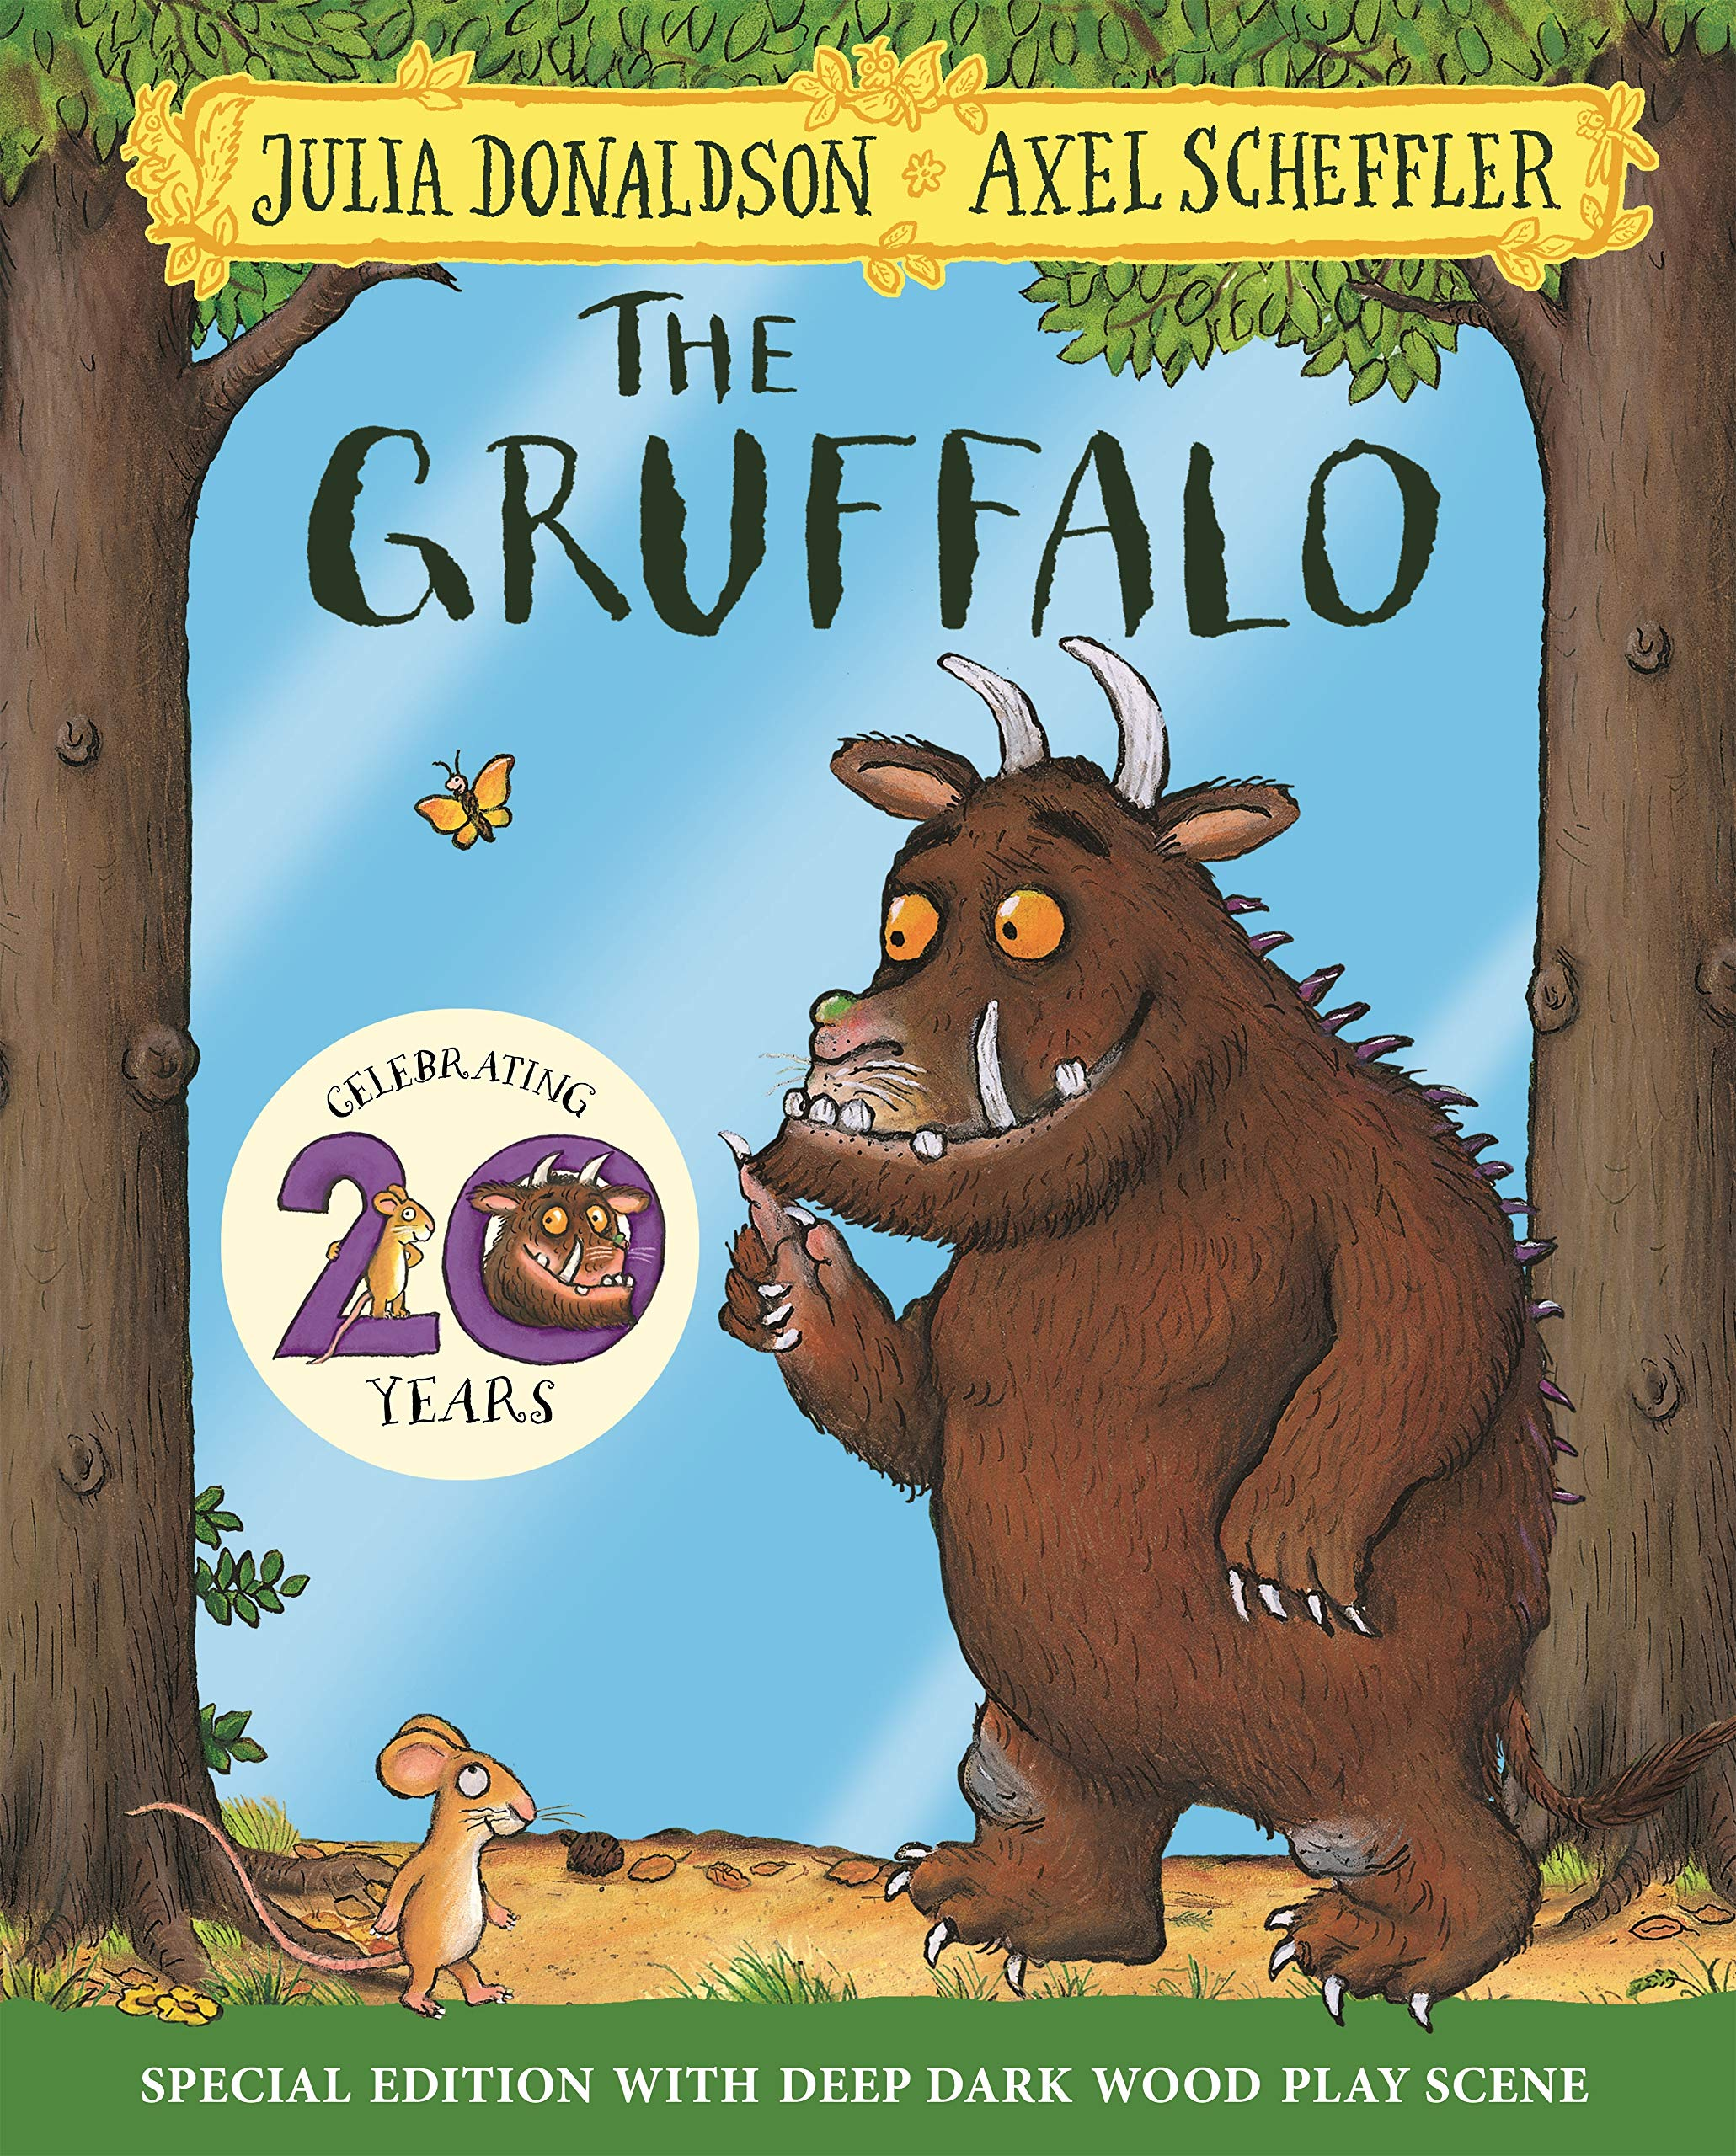 Donaldson, J: Gruffalo 20th Anniversary Edition The Gruffalo: Amazon.es: Donaldson, Julia, Scheffler, Axel: Libros en idiomas extranjeros